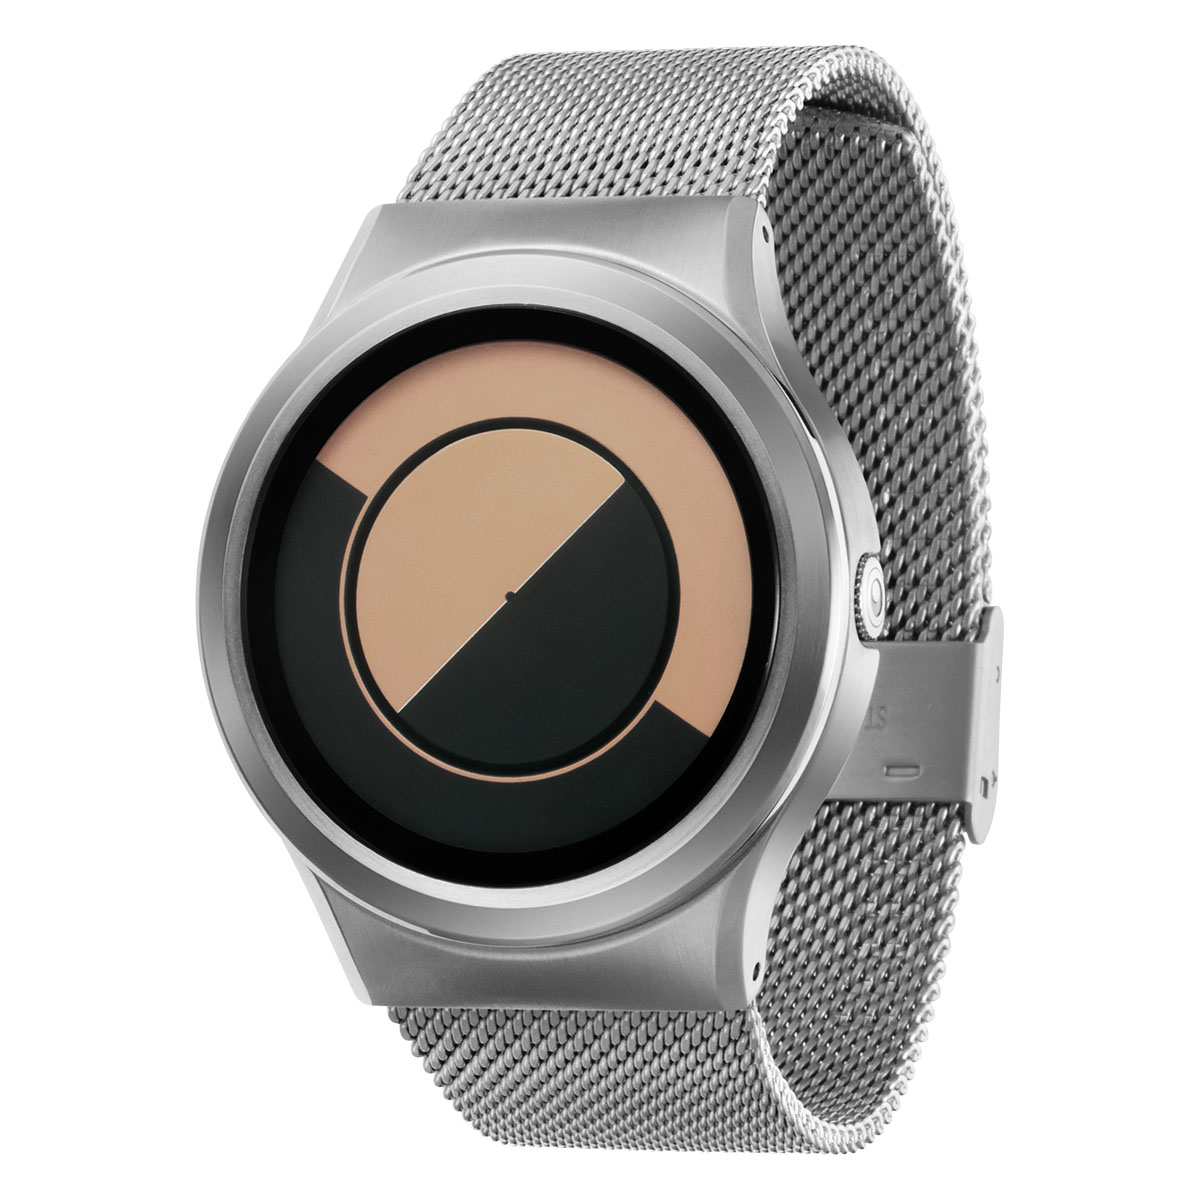 ZEROO QUARTER MOON ゼロ 電池式クォーツ 腕時計 [W08033B01SM01] ベージュ デザインウォッチ ペア用 メンズ レディース ユニセックス おしゃれ時計 デザイナーズ